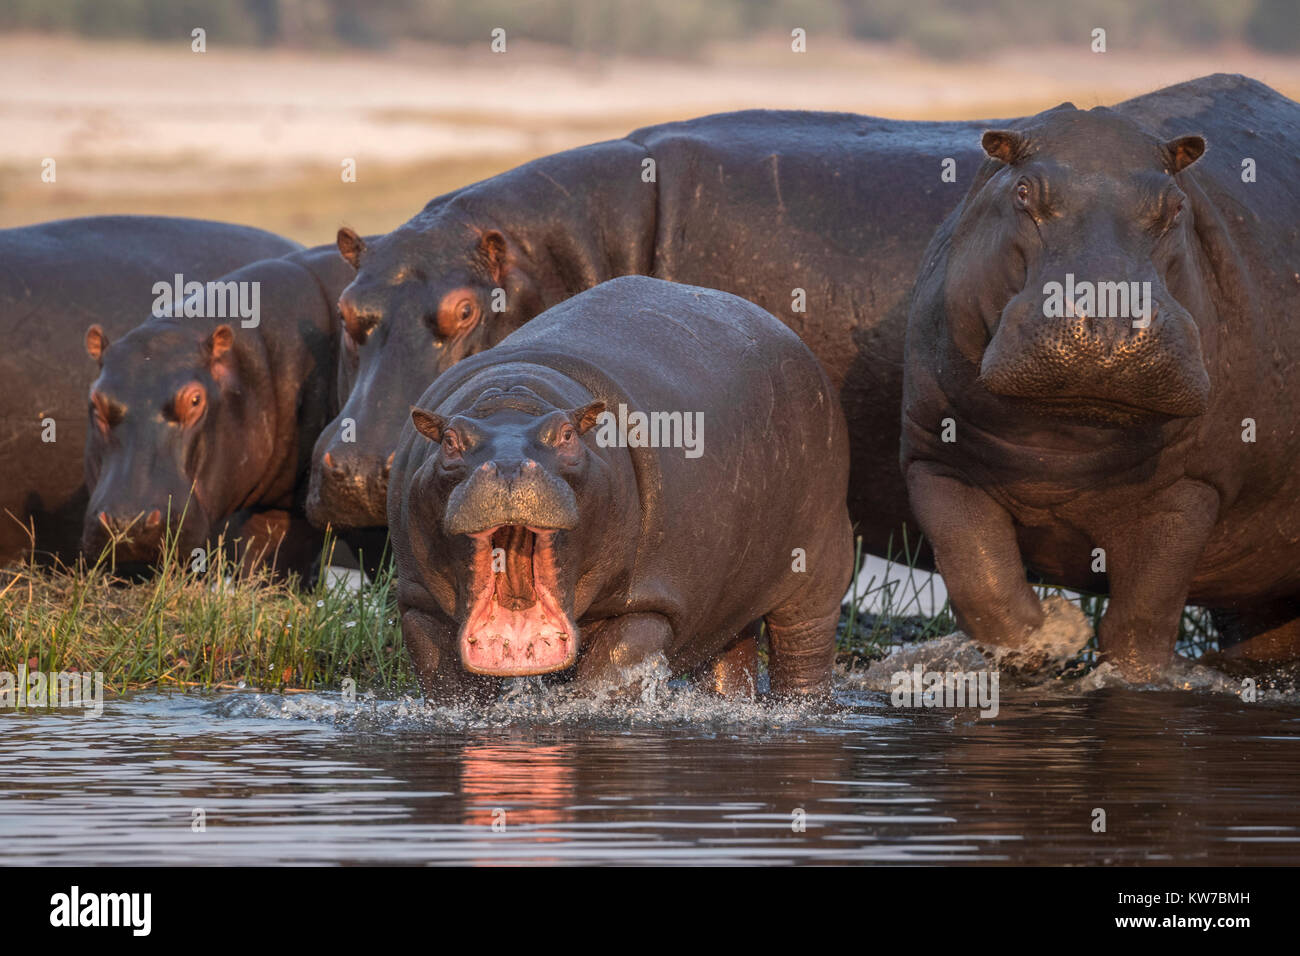 Hippos (Hippopotamus amphibius), Chobe river, Botswana, September 2017 - Stock Image